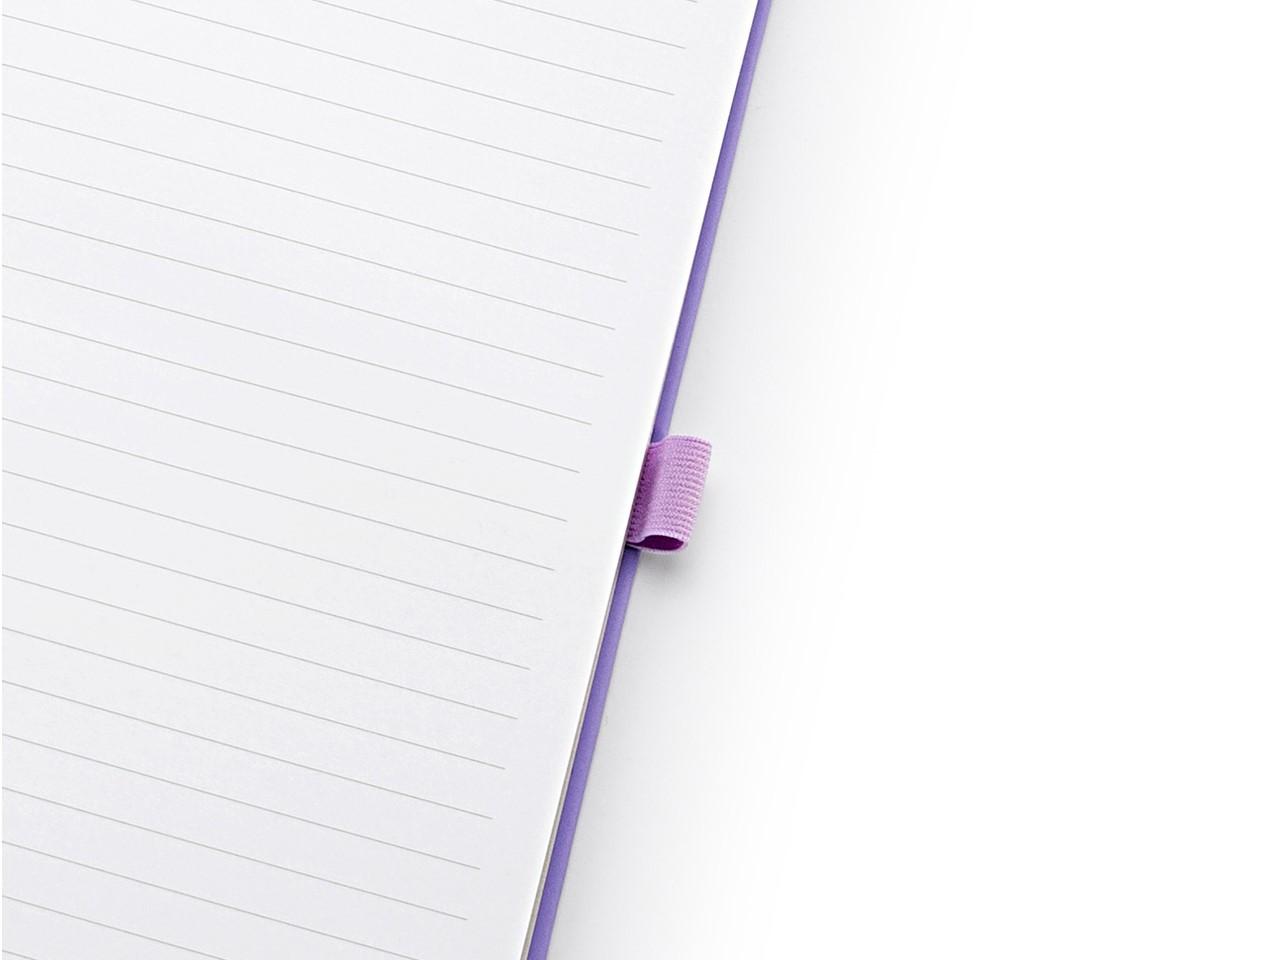 Caderno Romantic 90 Folhas Pautadas Lilás